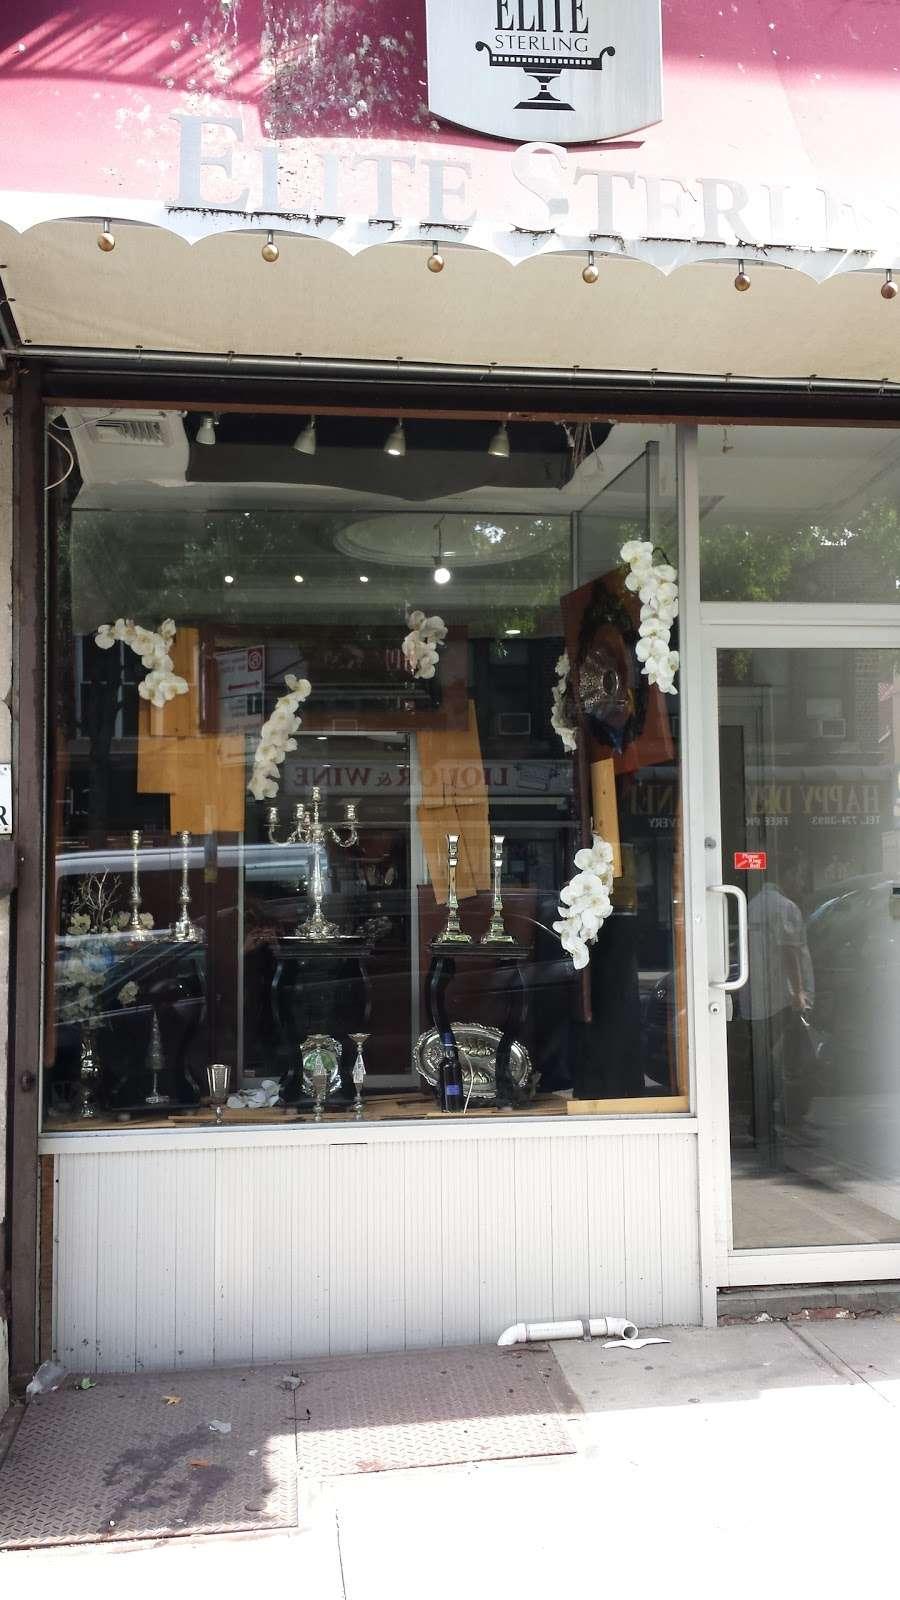 Elite Sterling - store  | Photo 1 of 9 | Address: 321 Kingston Ave, Brooklyn, NY 11213, USA | Phone: (718) 778-2161